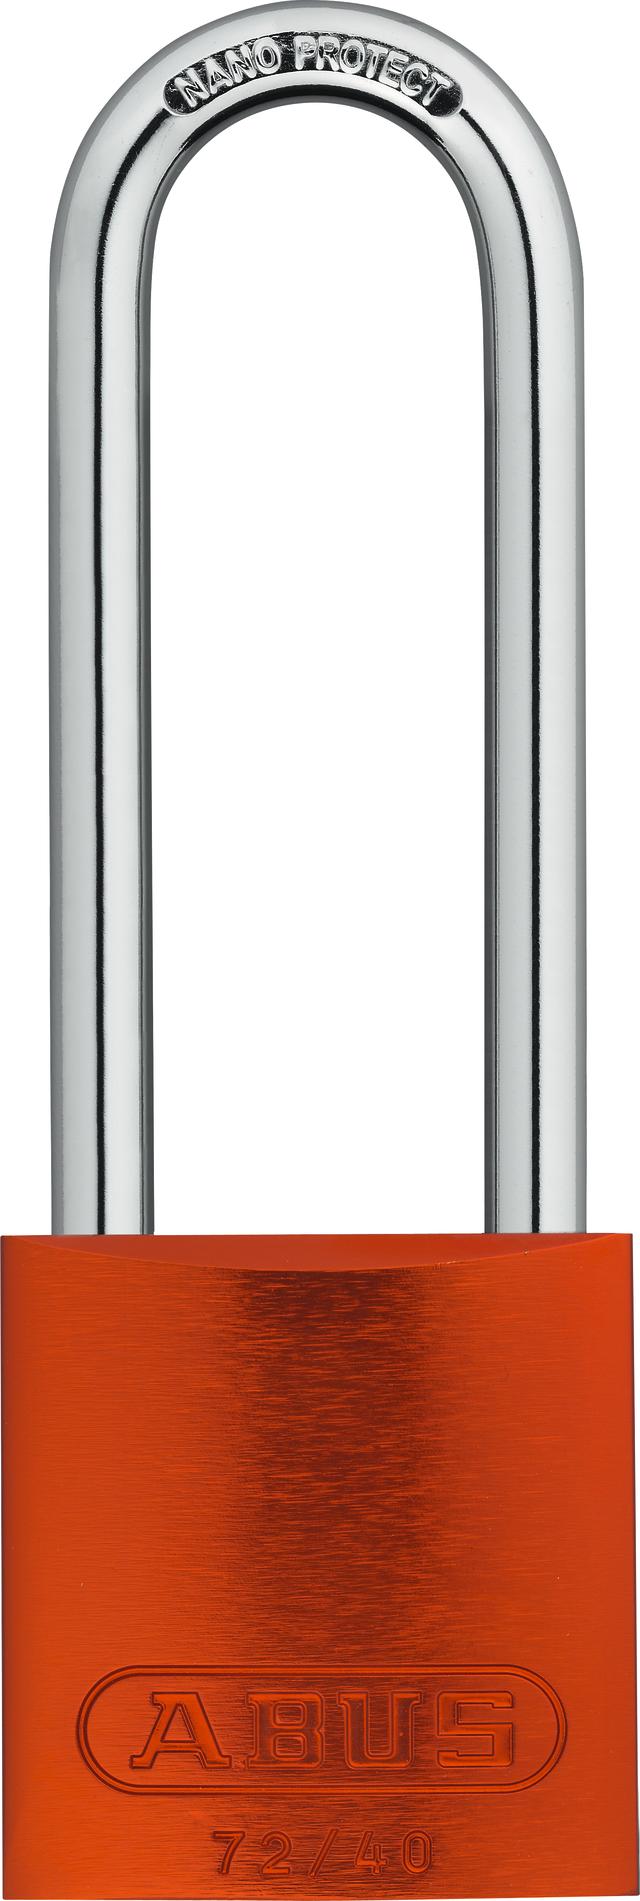 Vorhangschloss Aluminium 72/40HB75 orange